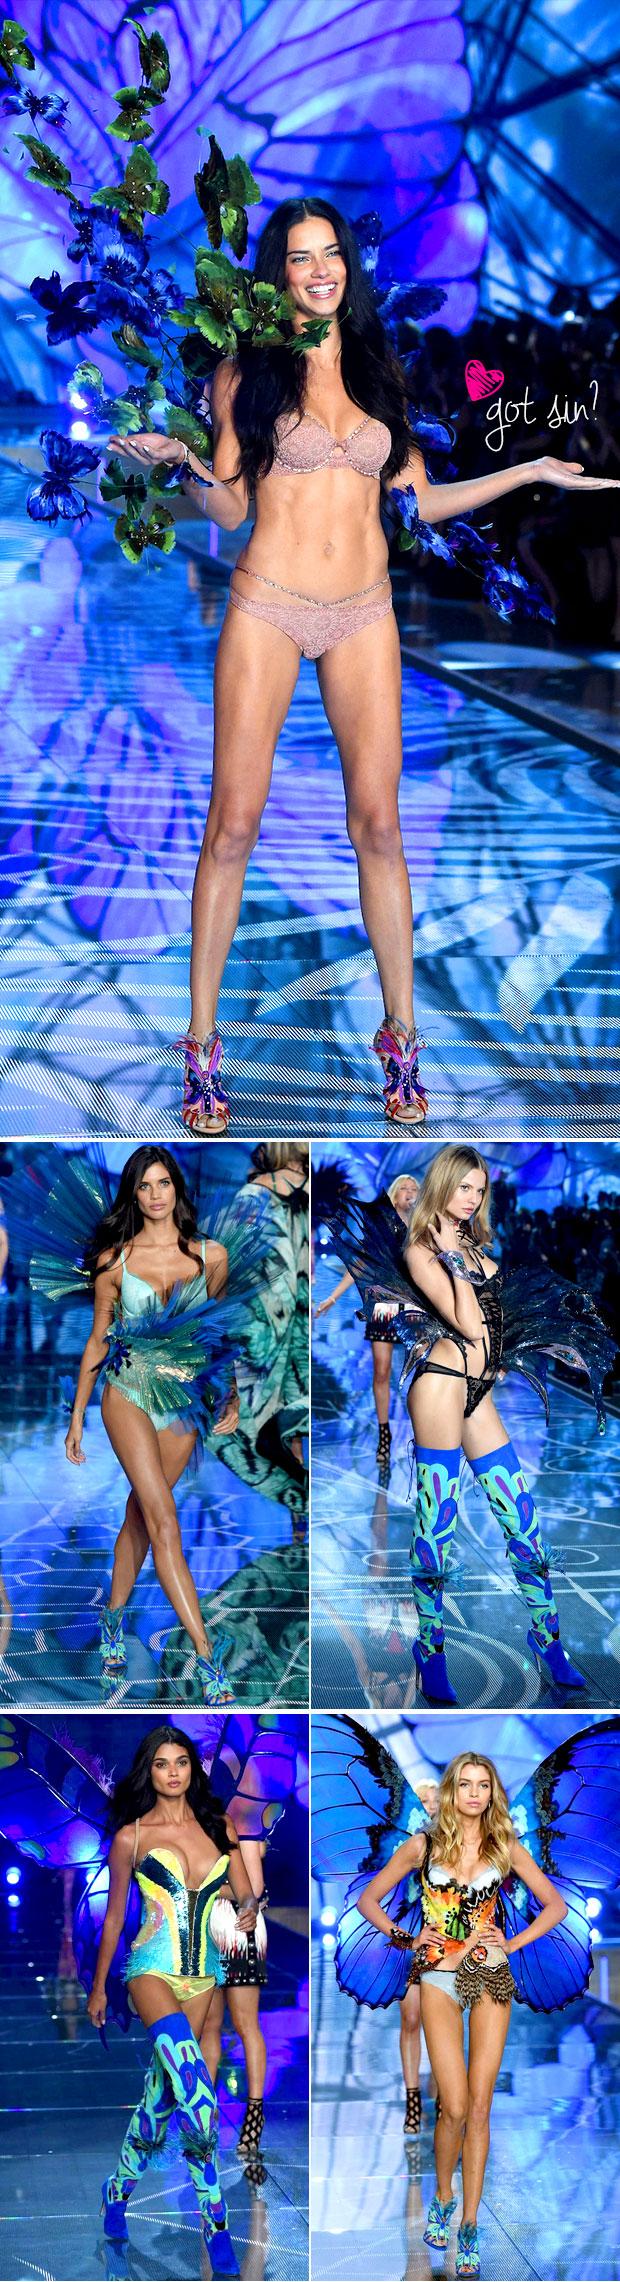 victorias-secret-fashion-show-todas-as-fotos-blog-got-sin-exotic-butterflies-adriana-lima